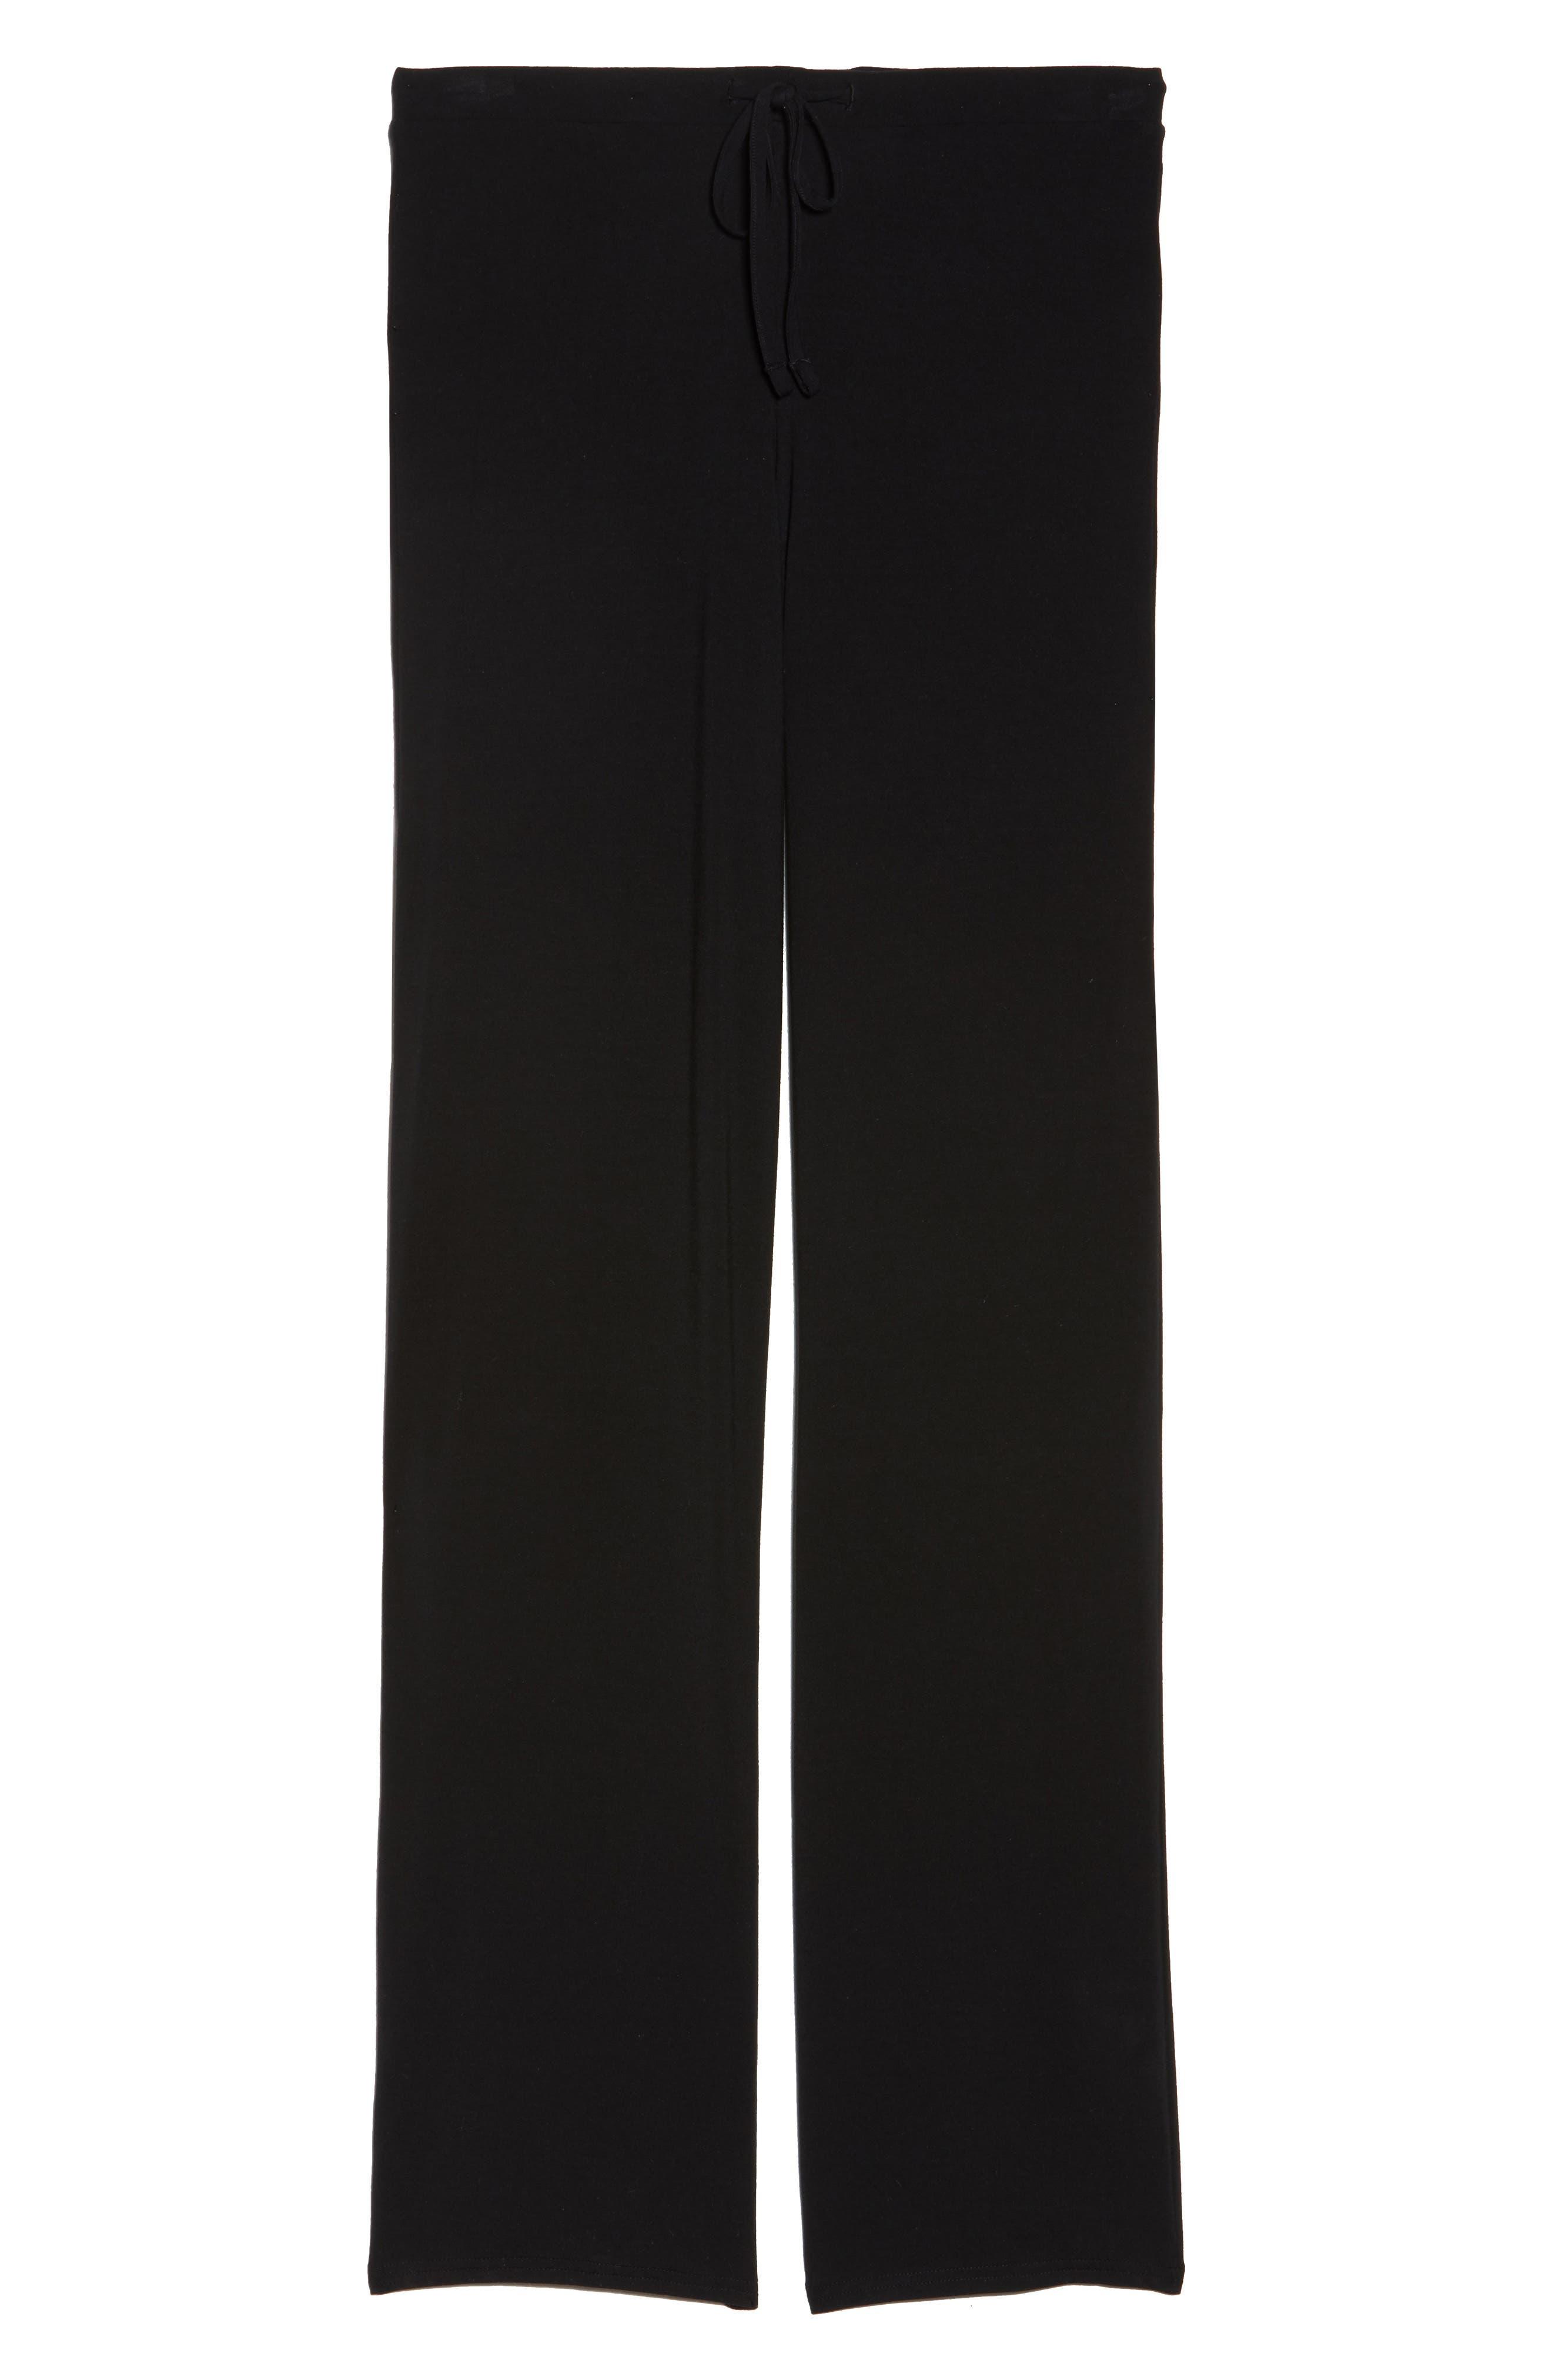 Breathe Stretch Modal Pants,                             Alternate thumbnail 6, color,                             BLACK